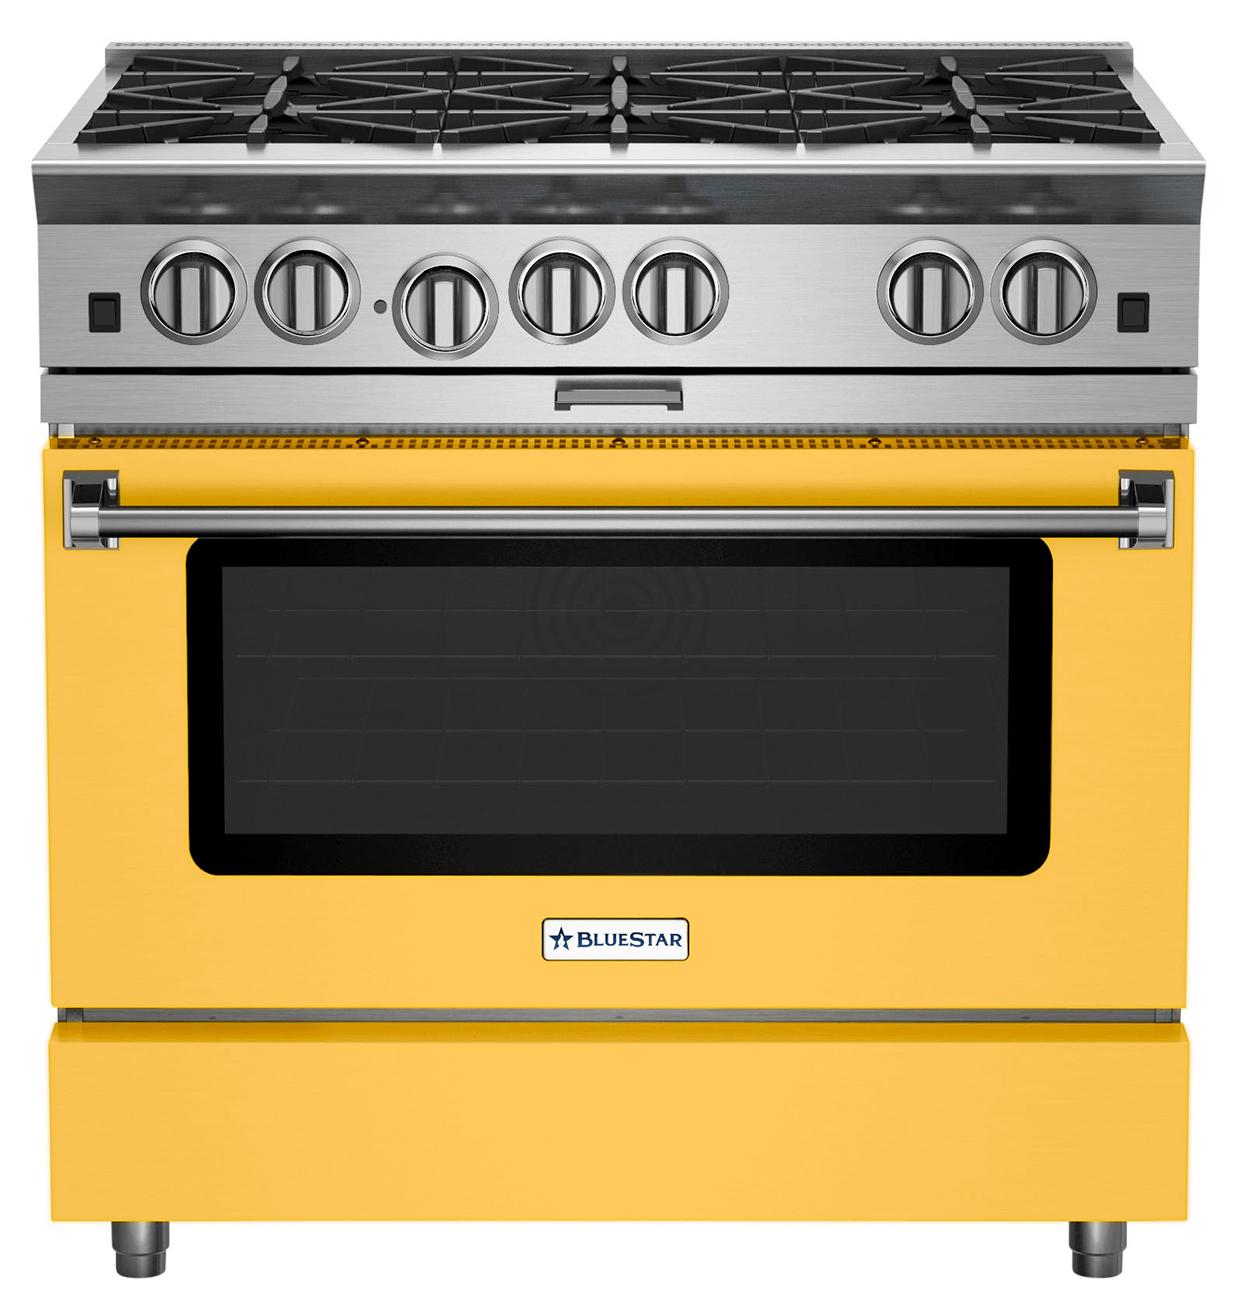 BlueStar Cooking yellow range